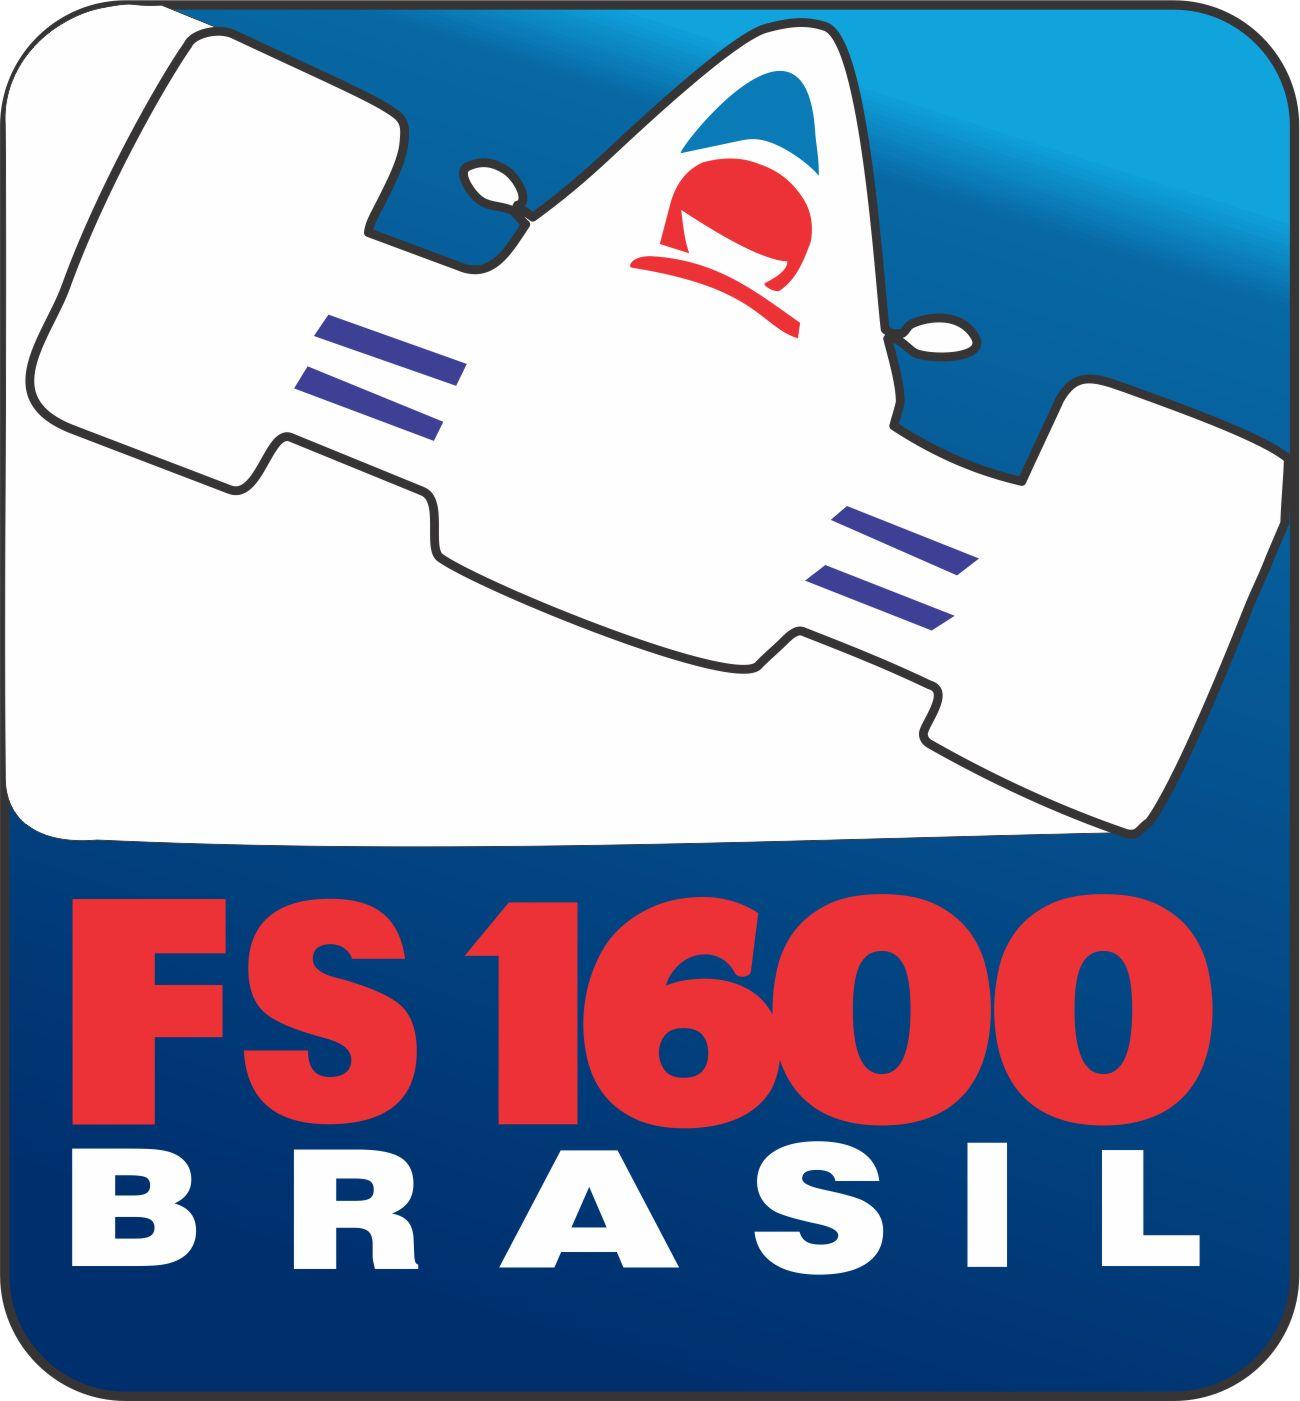 FS1600